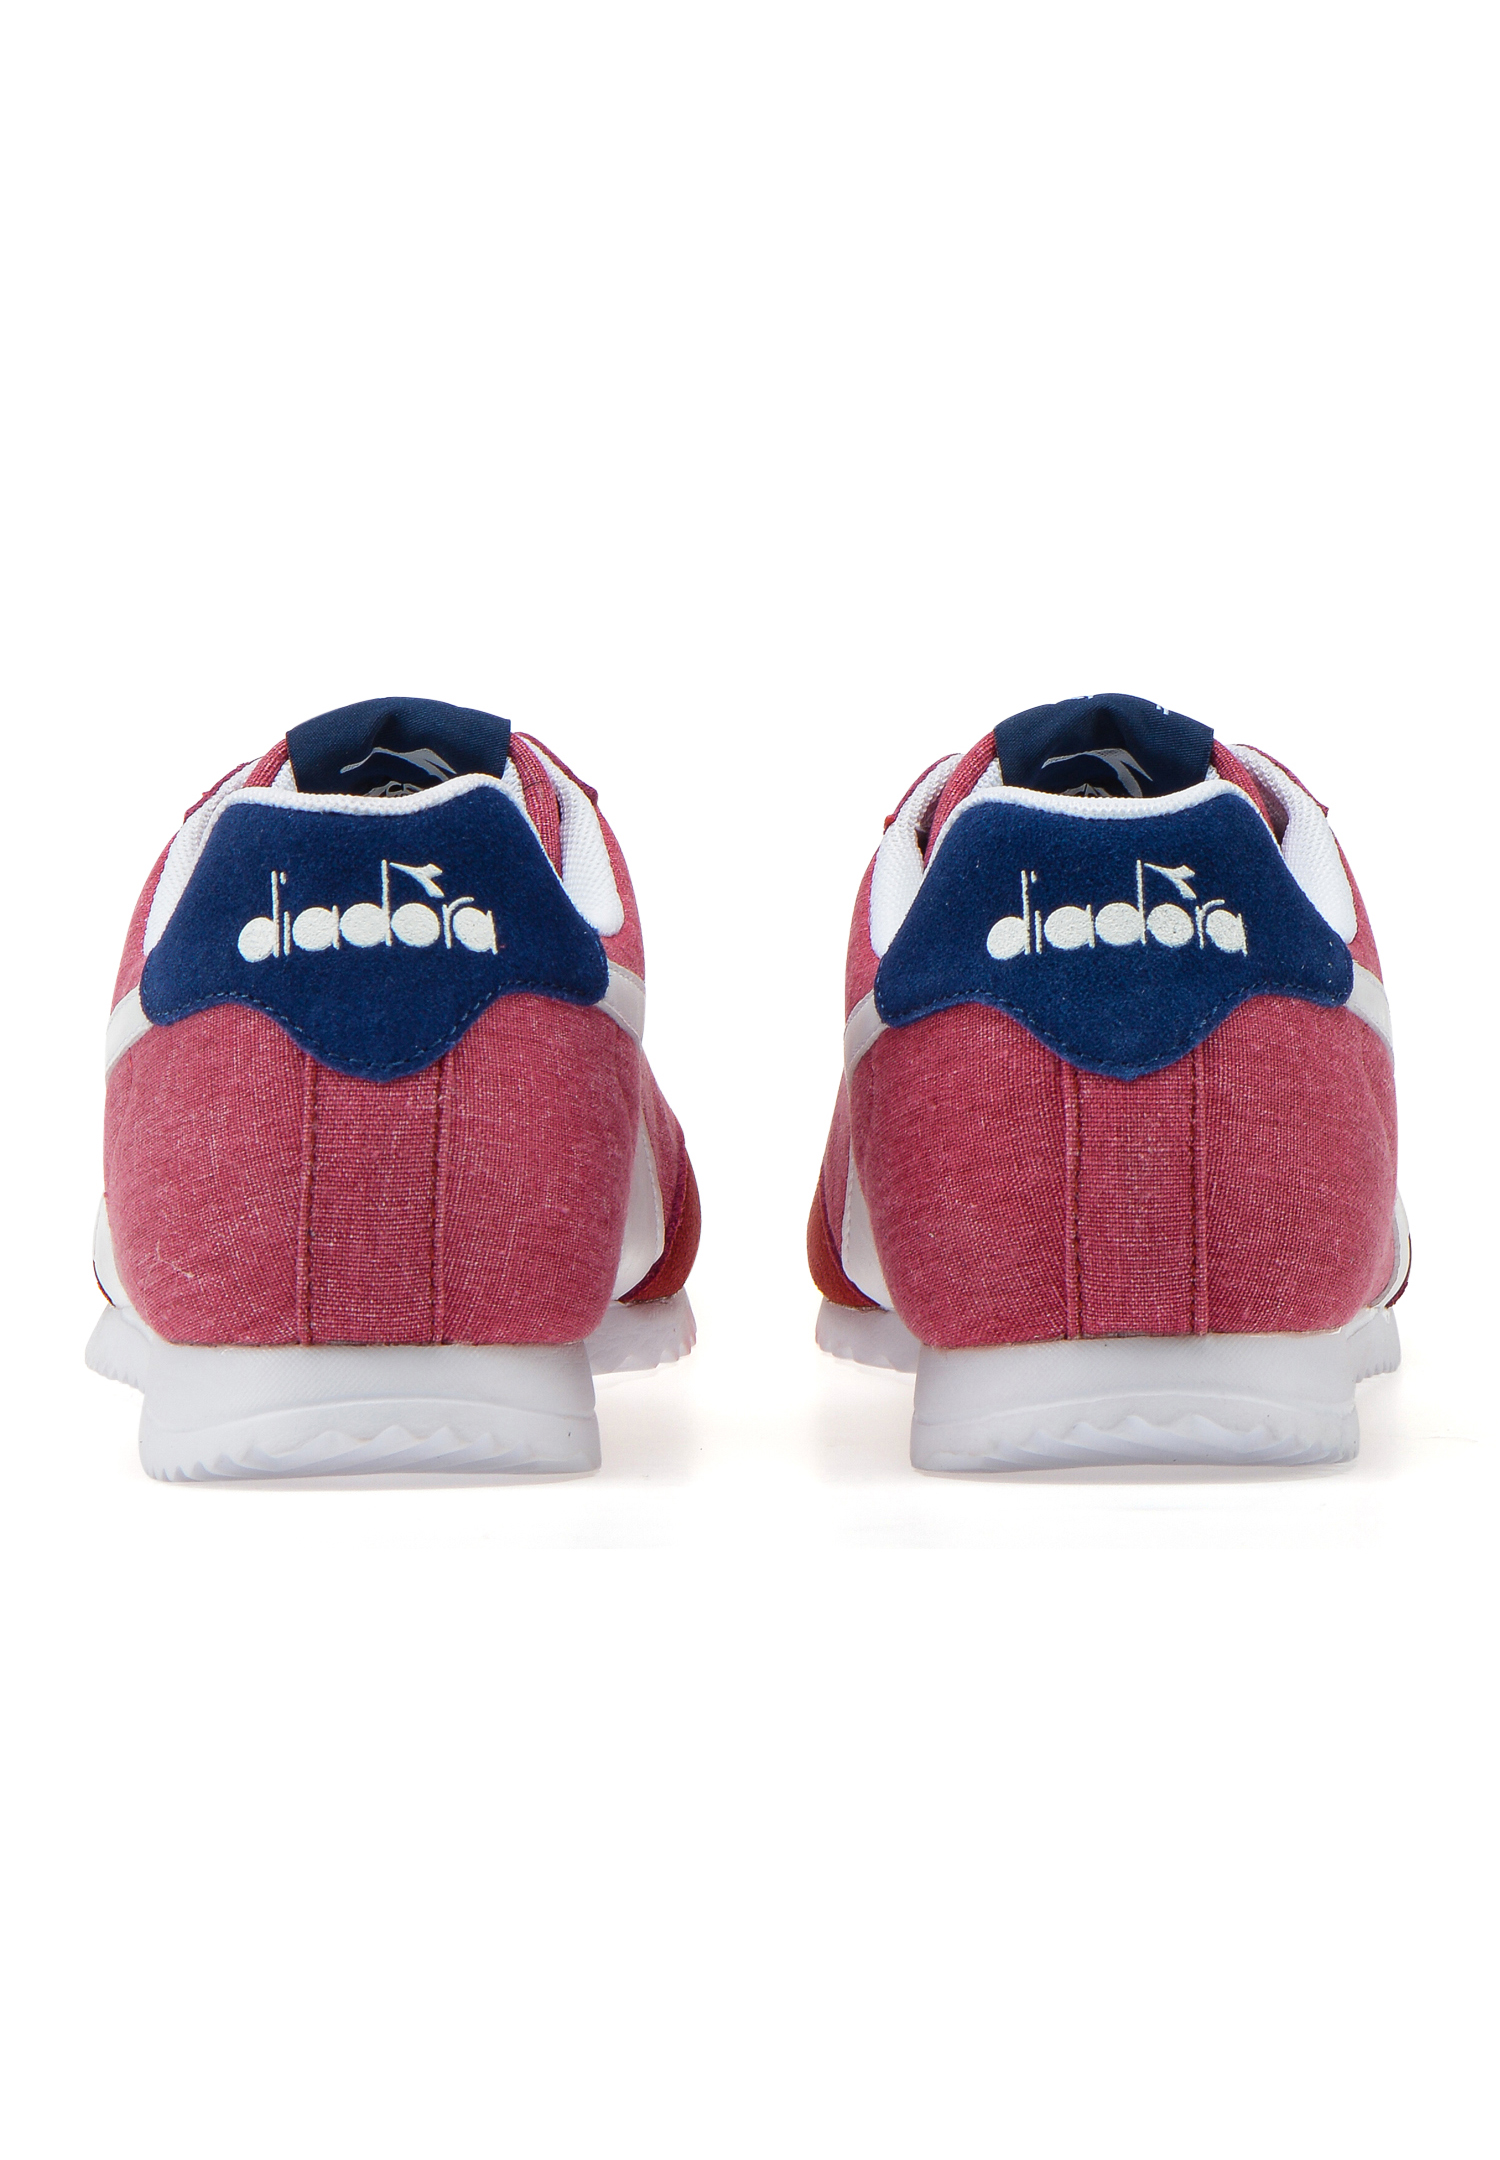 Scarpe-Diadora-Jog-Light-C-Sneakers-sportive-uomo-donna-vari-colori-e-taglie miniatura 13